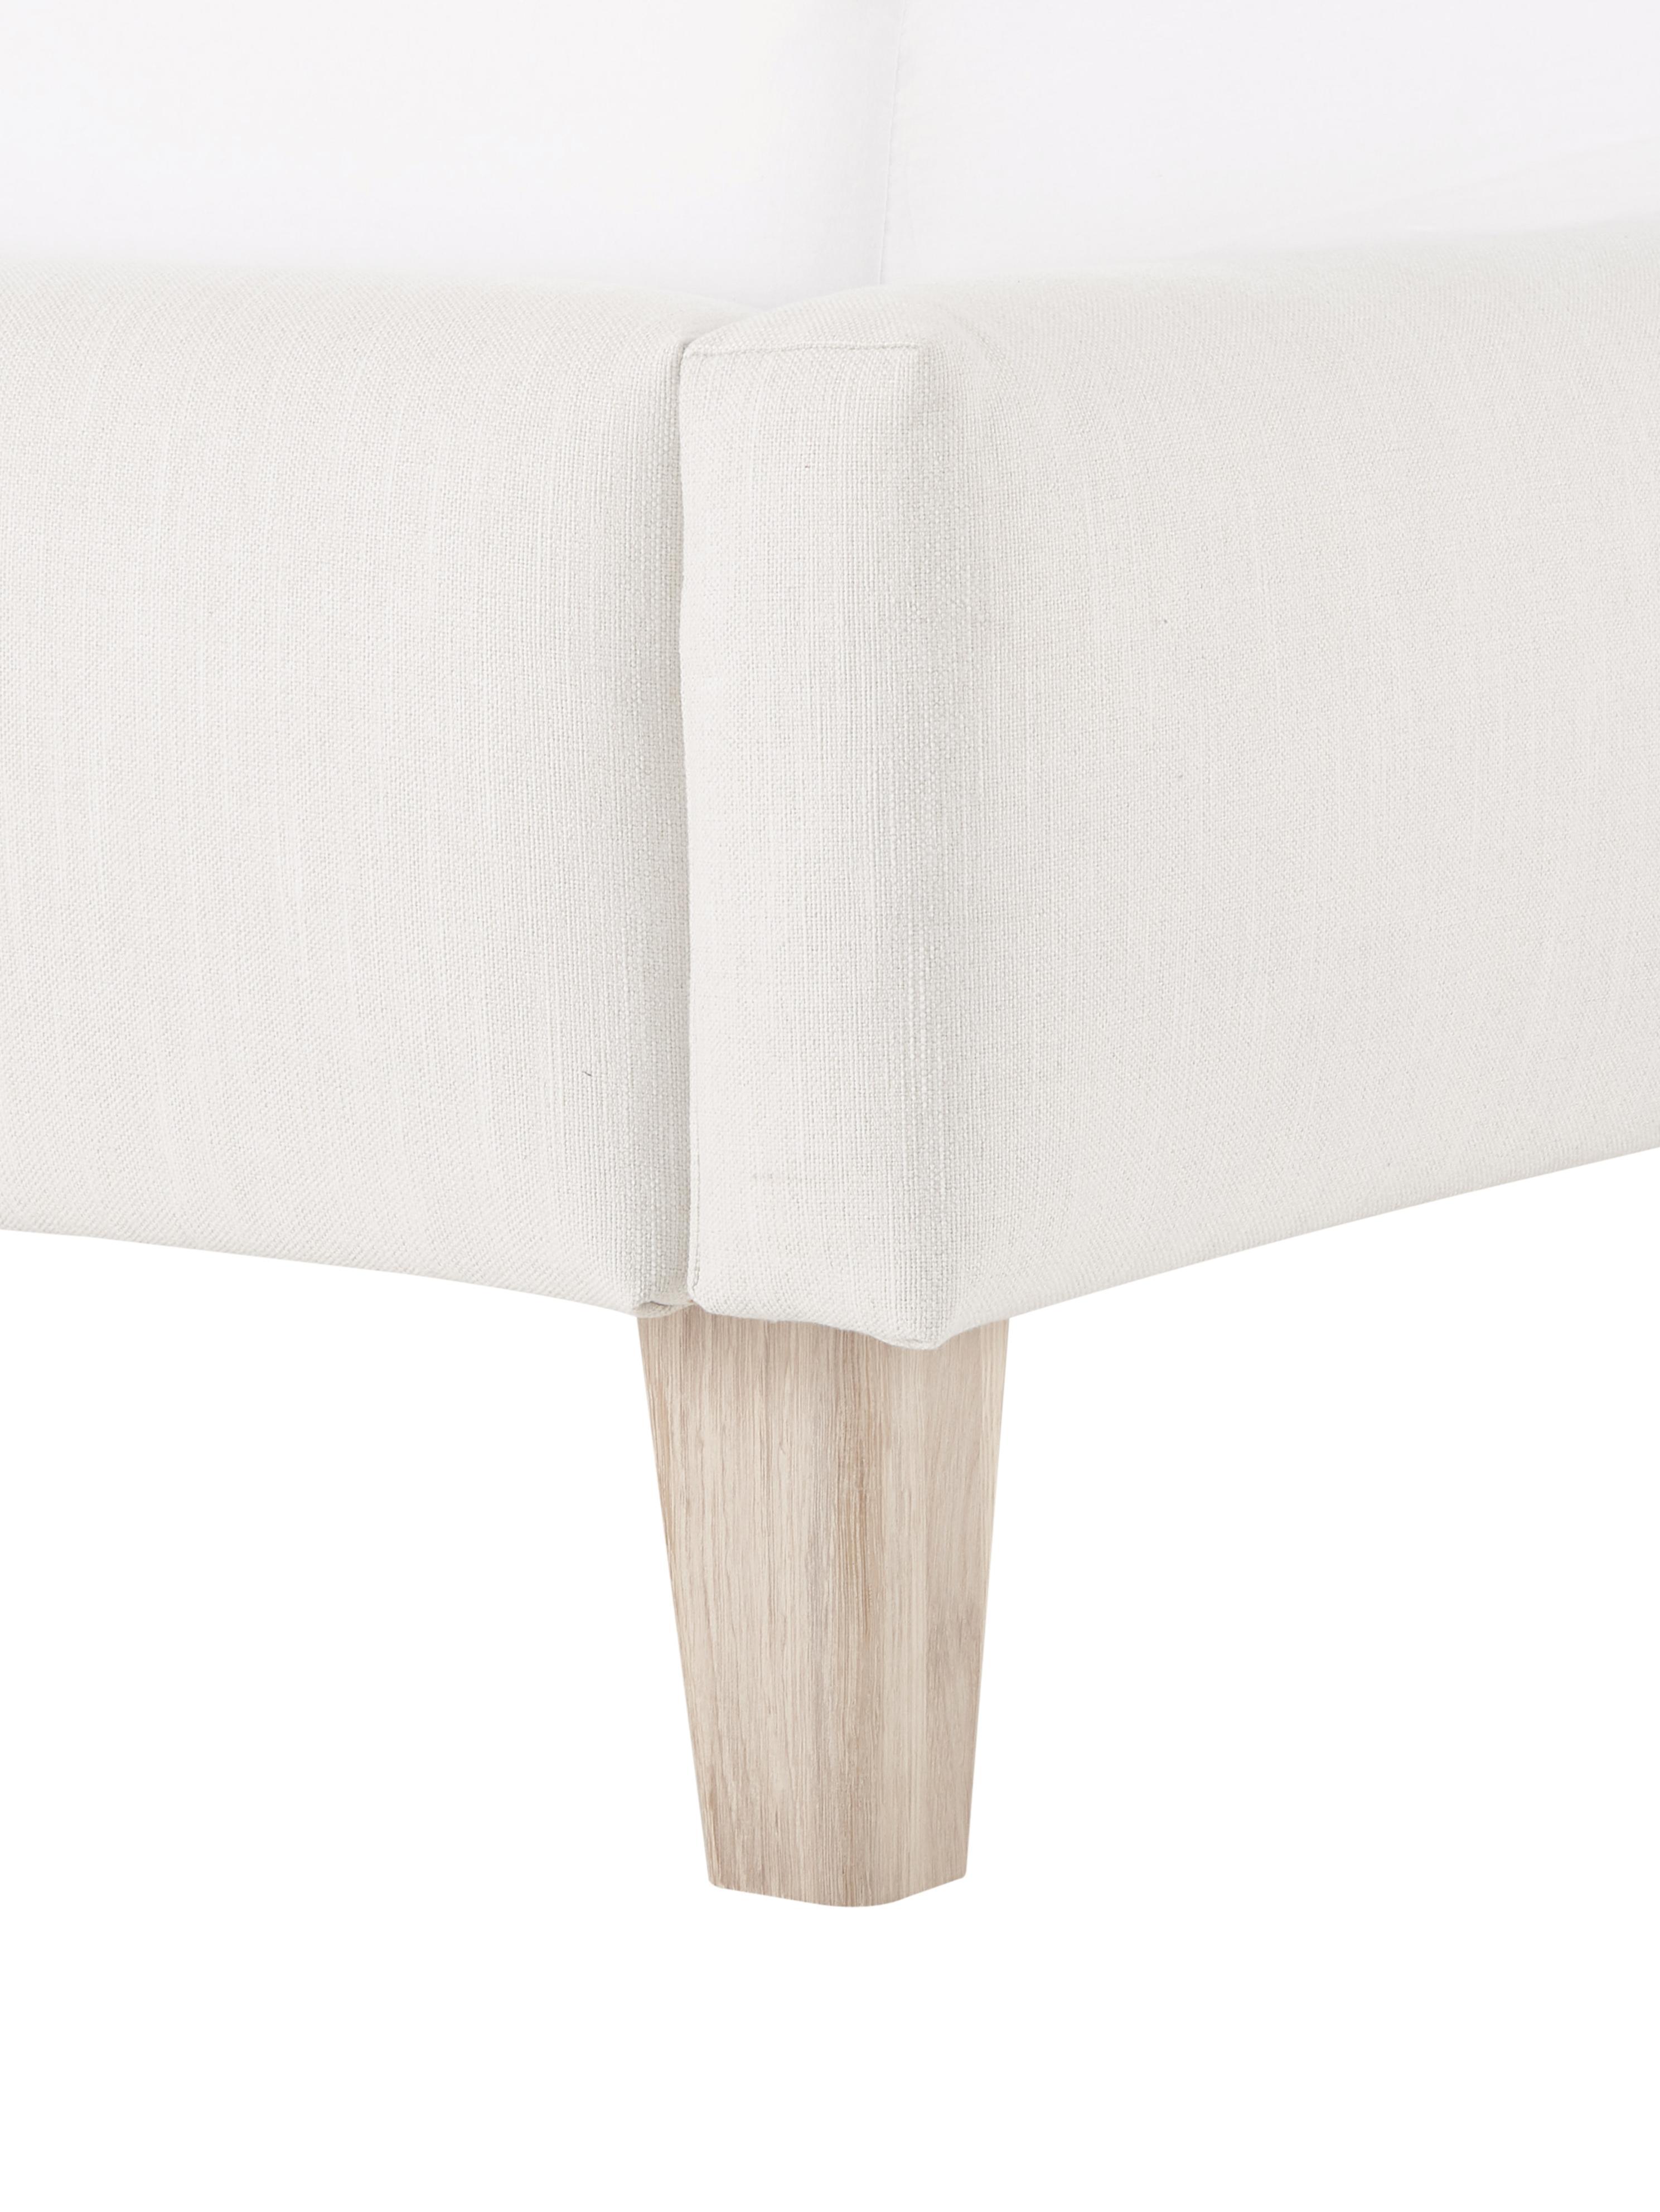 Polsterbett Serene, Korpus: Massives Kiefernholz, Füße: Massives Eichenholz, Bezug: Polyester (Strukturstoff), Beige, 180 x 200 cm